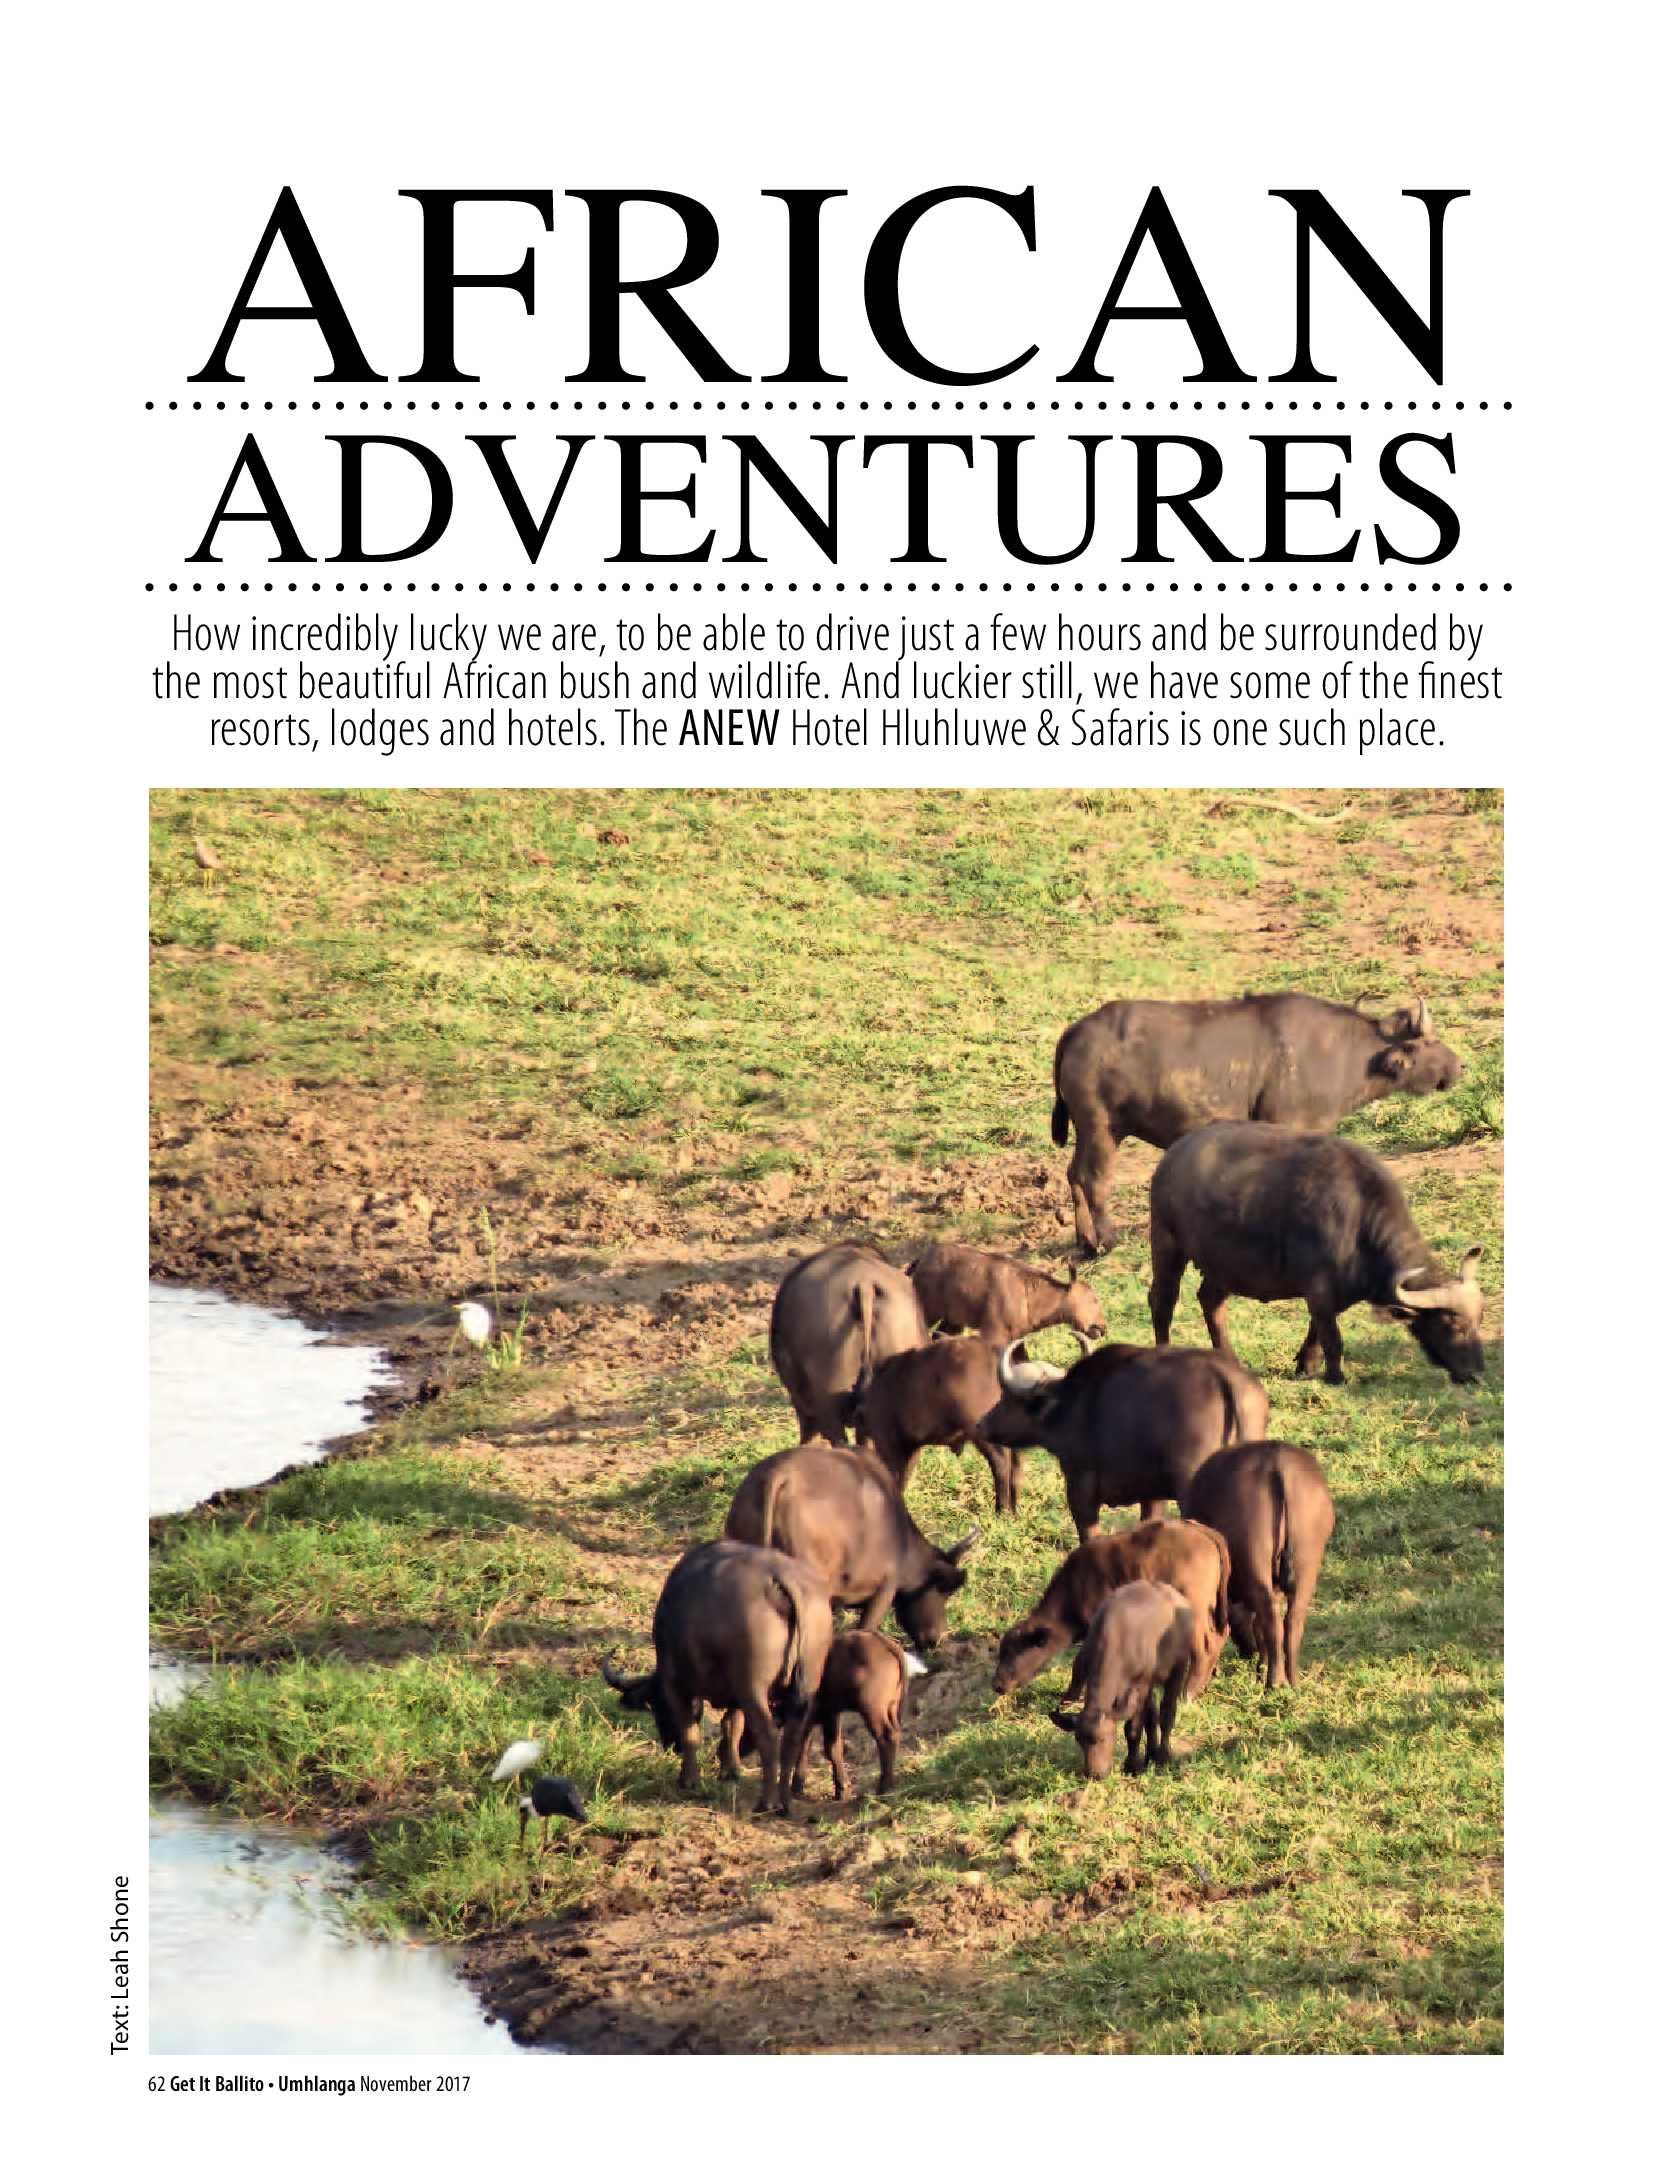 get-magazine-ballitoumhlanga-november-2017-2-epapers-page-64